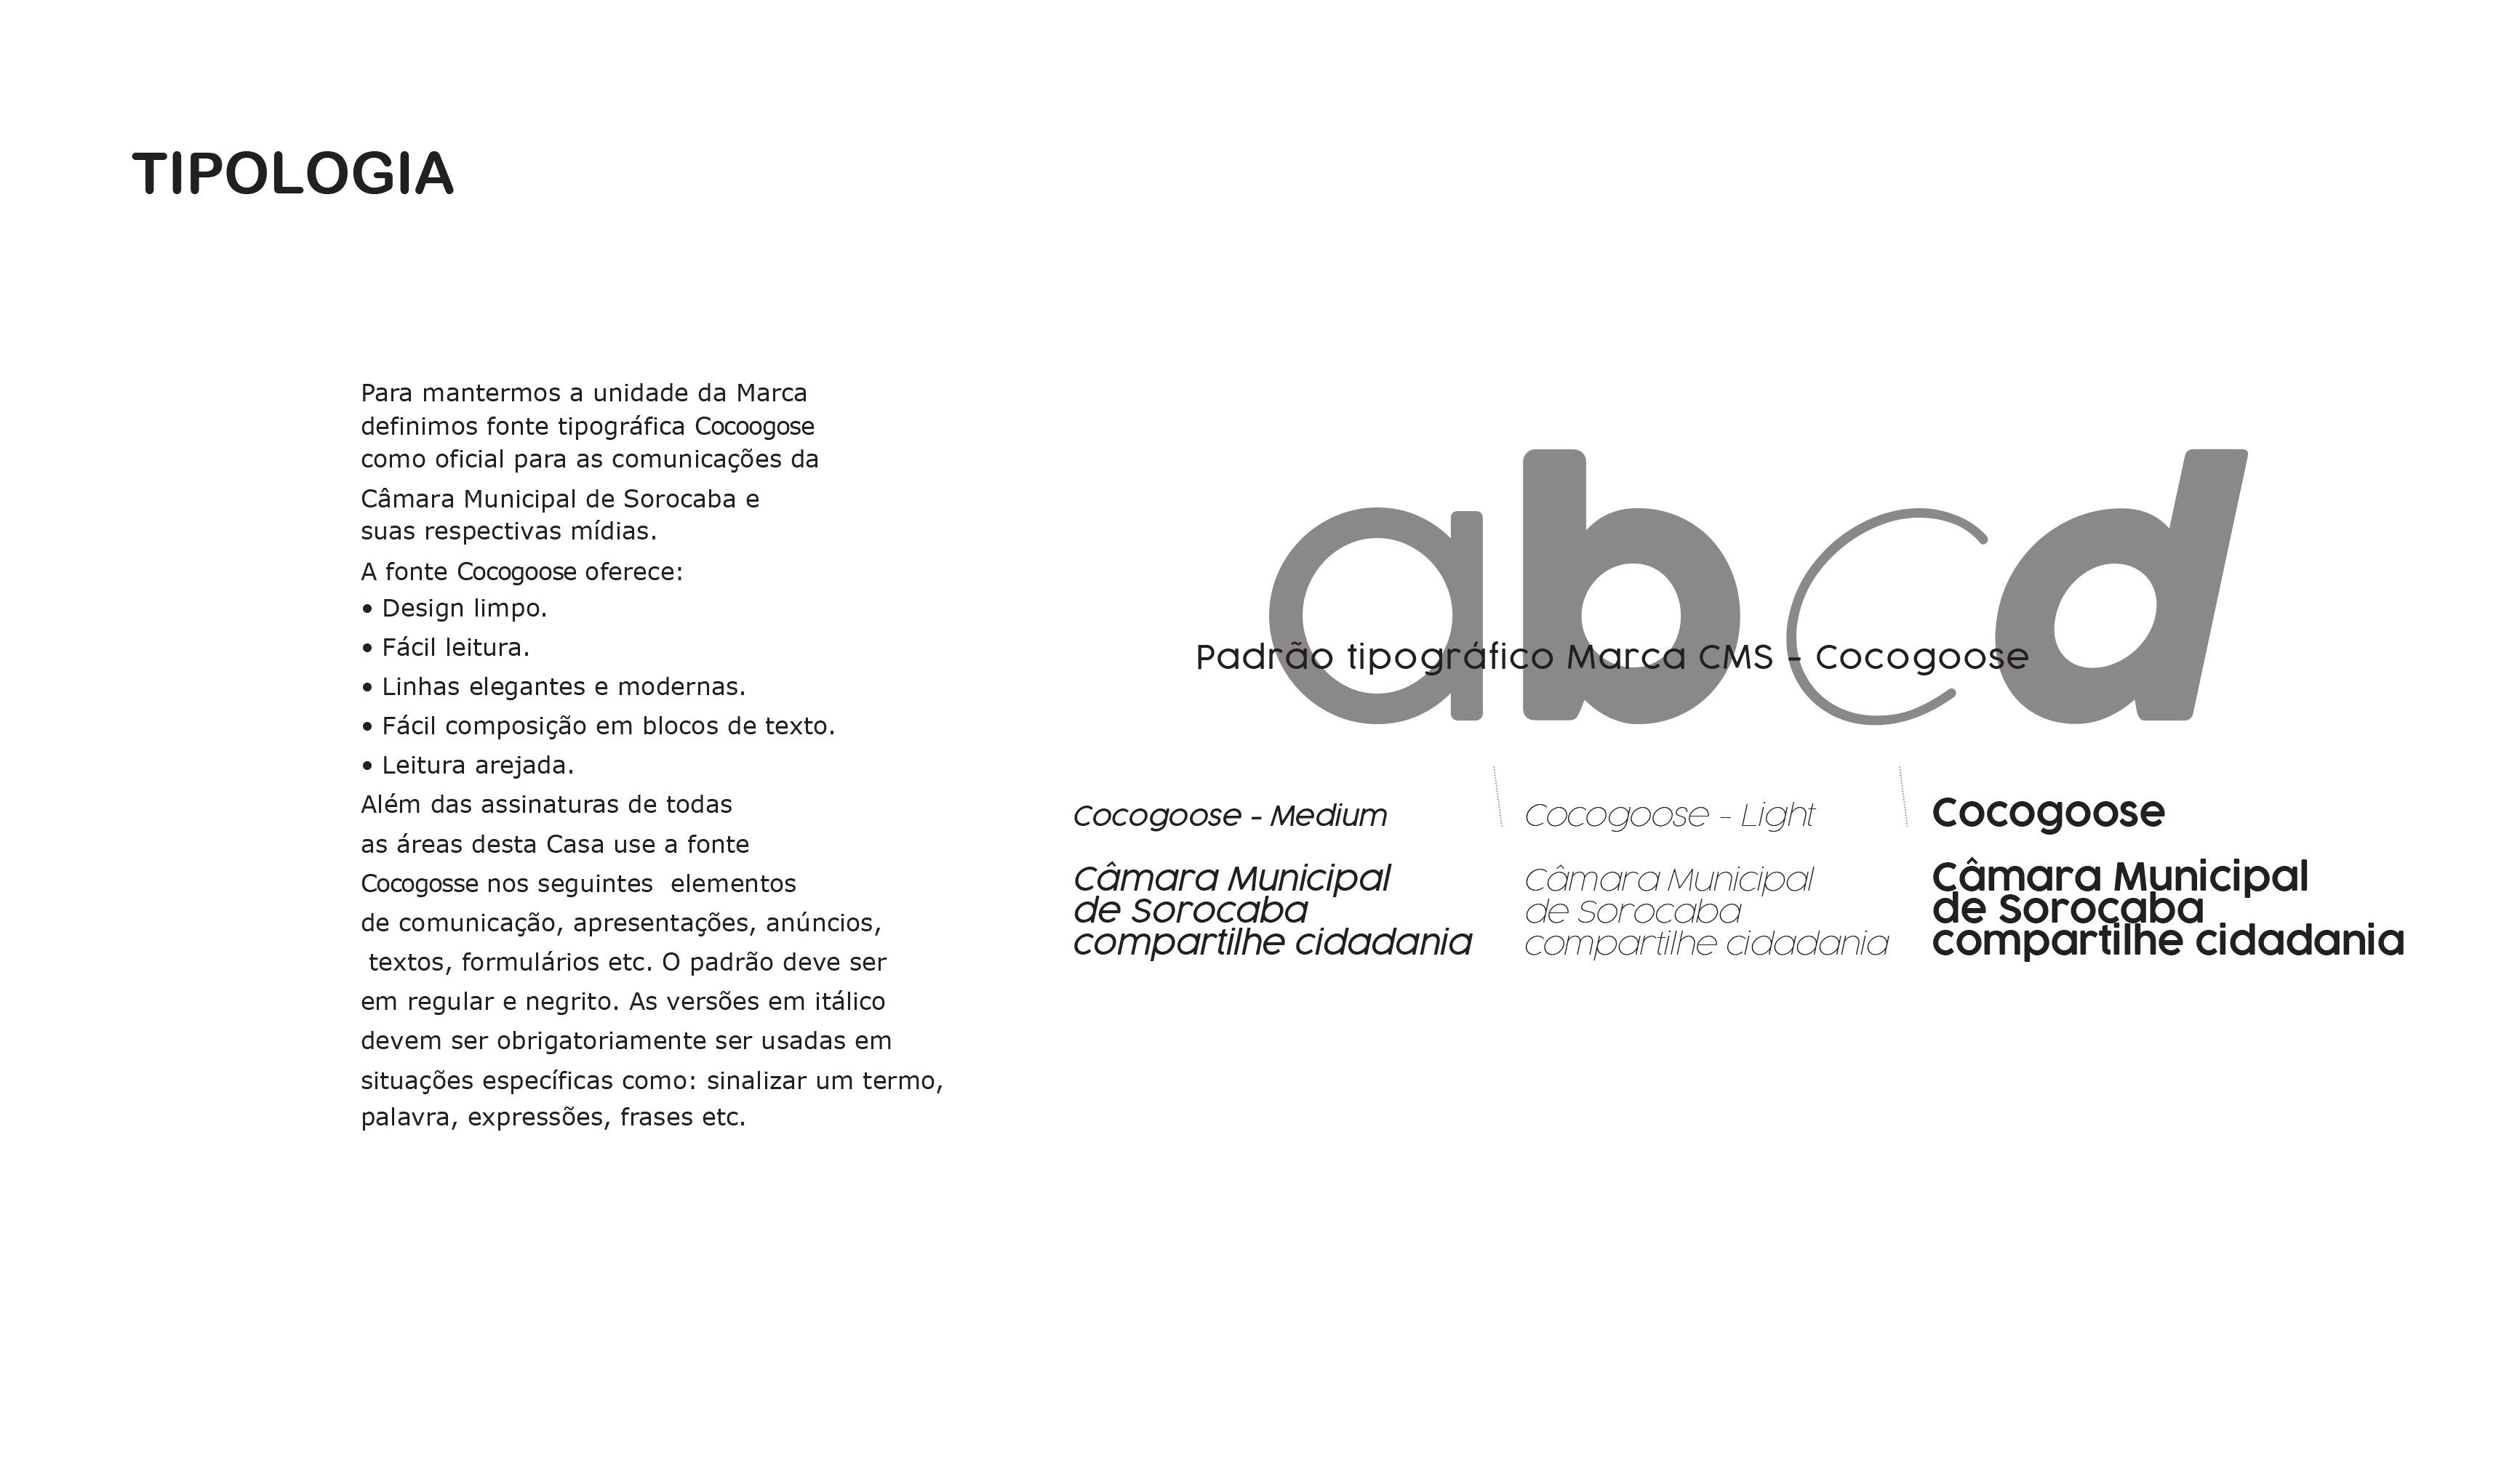 MANUAL DE IDENTIDADE VISUAL CAMARA SOROCABA revisado -12